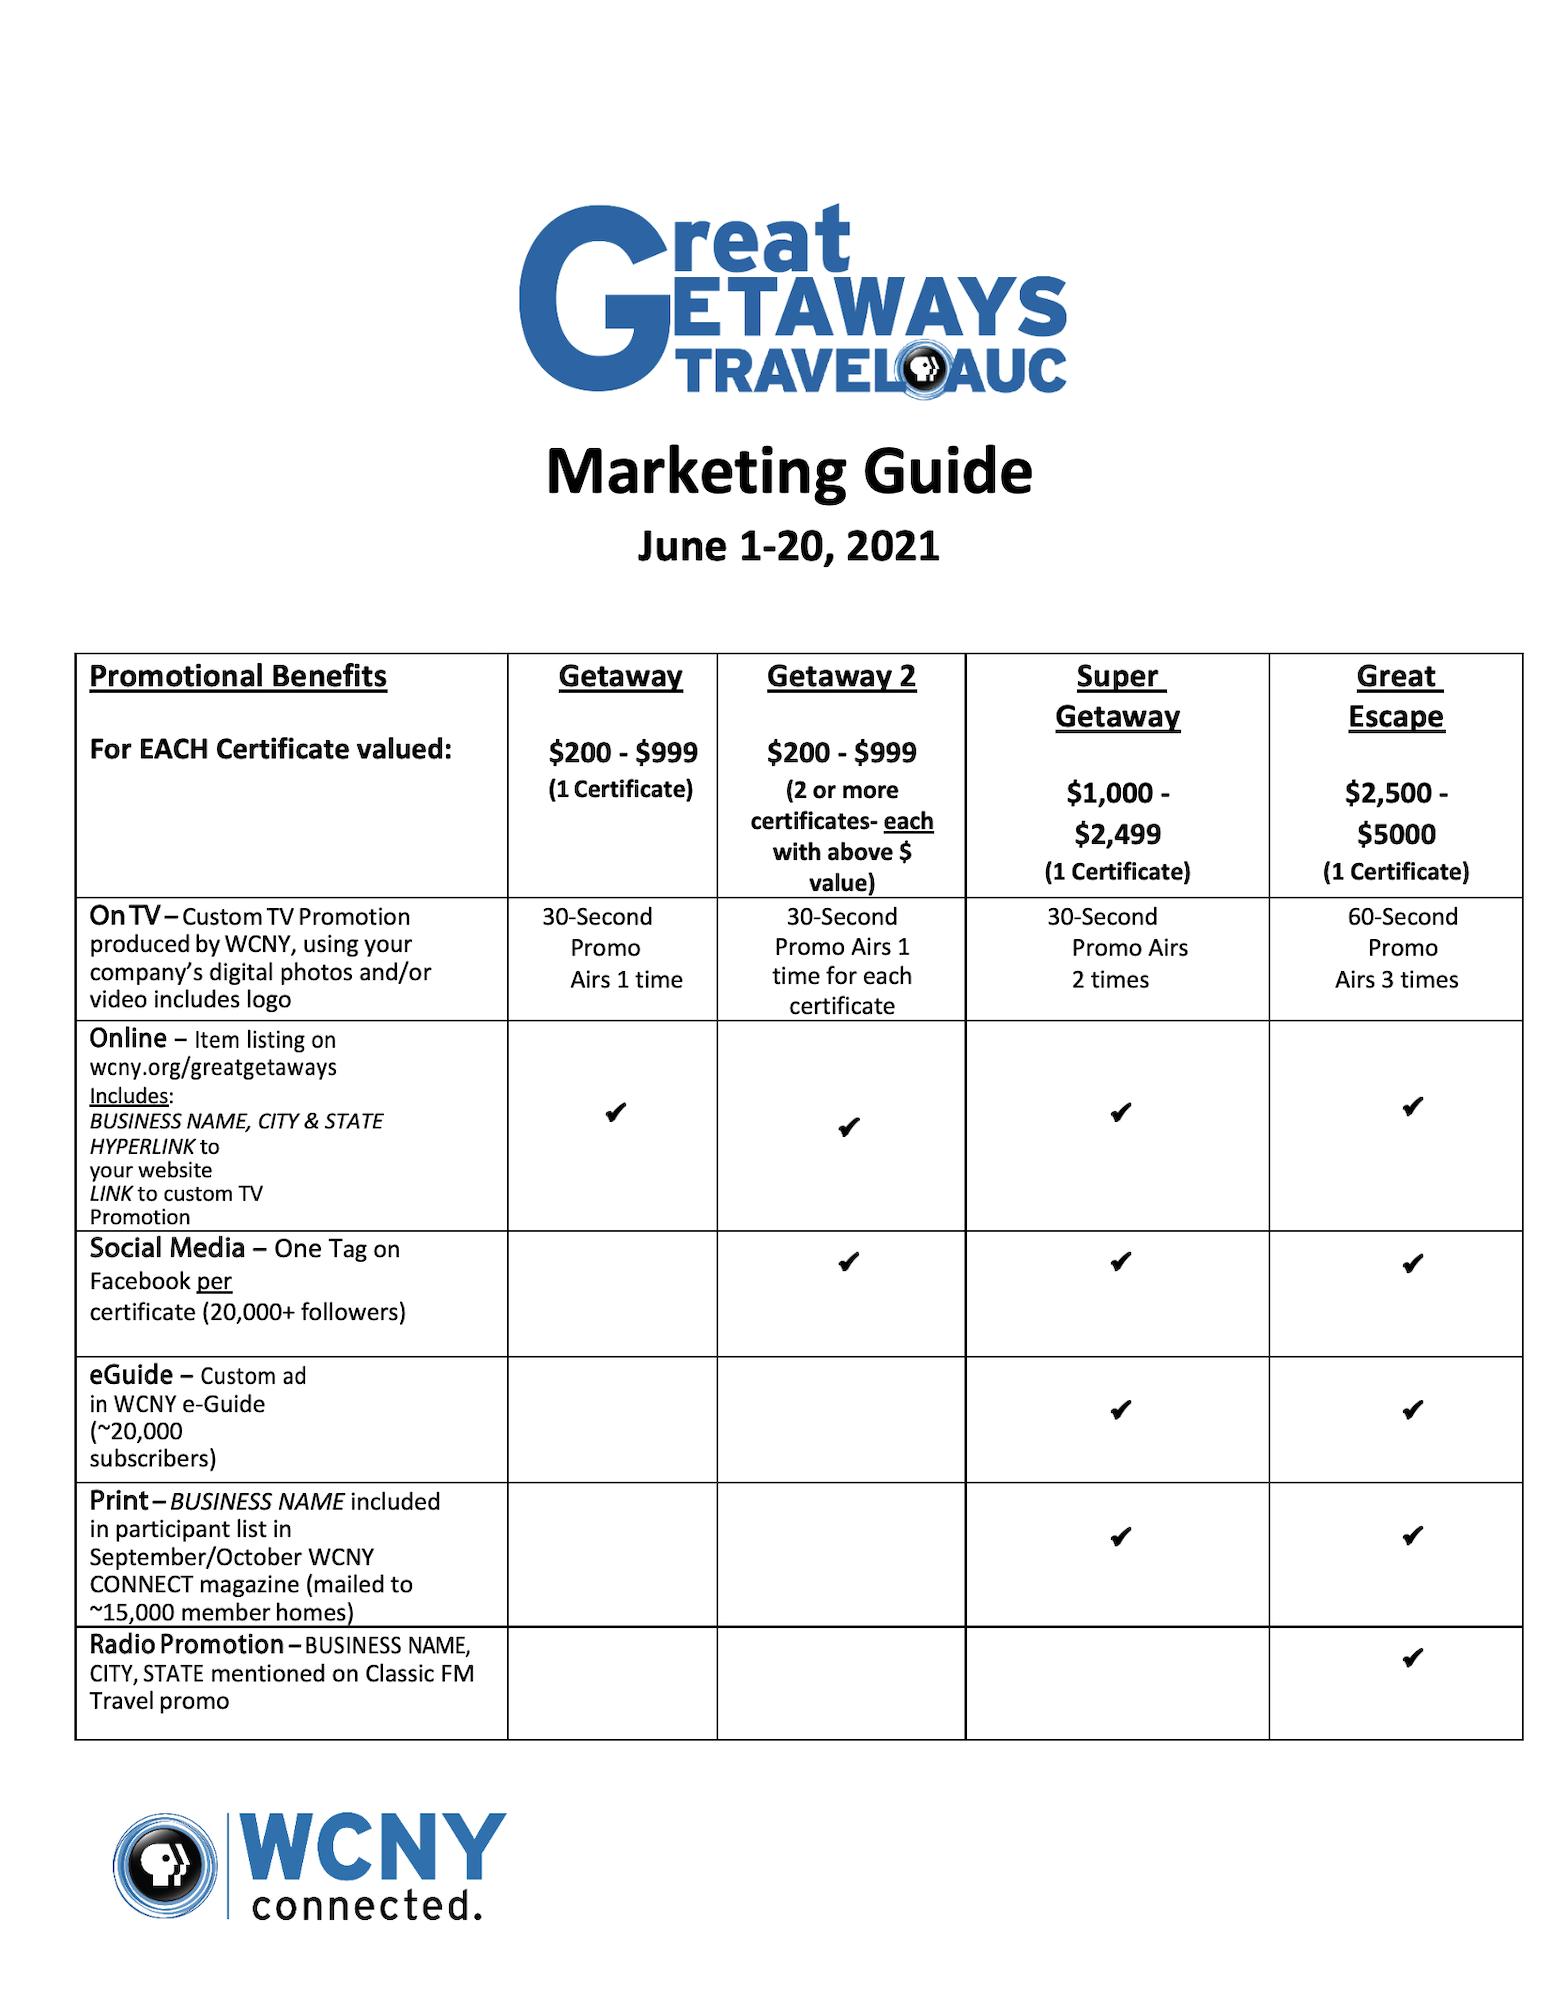 great_get aways marrkting guide